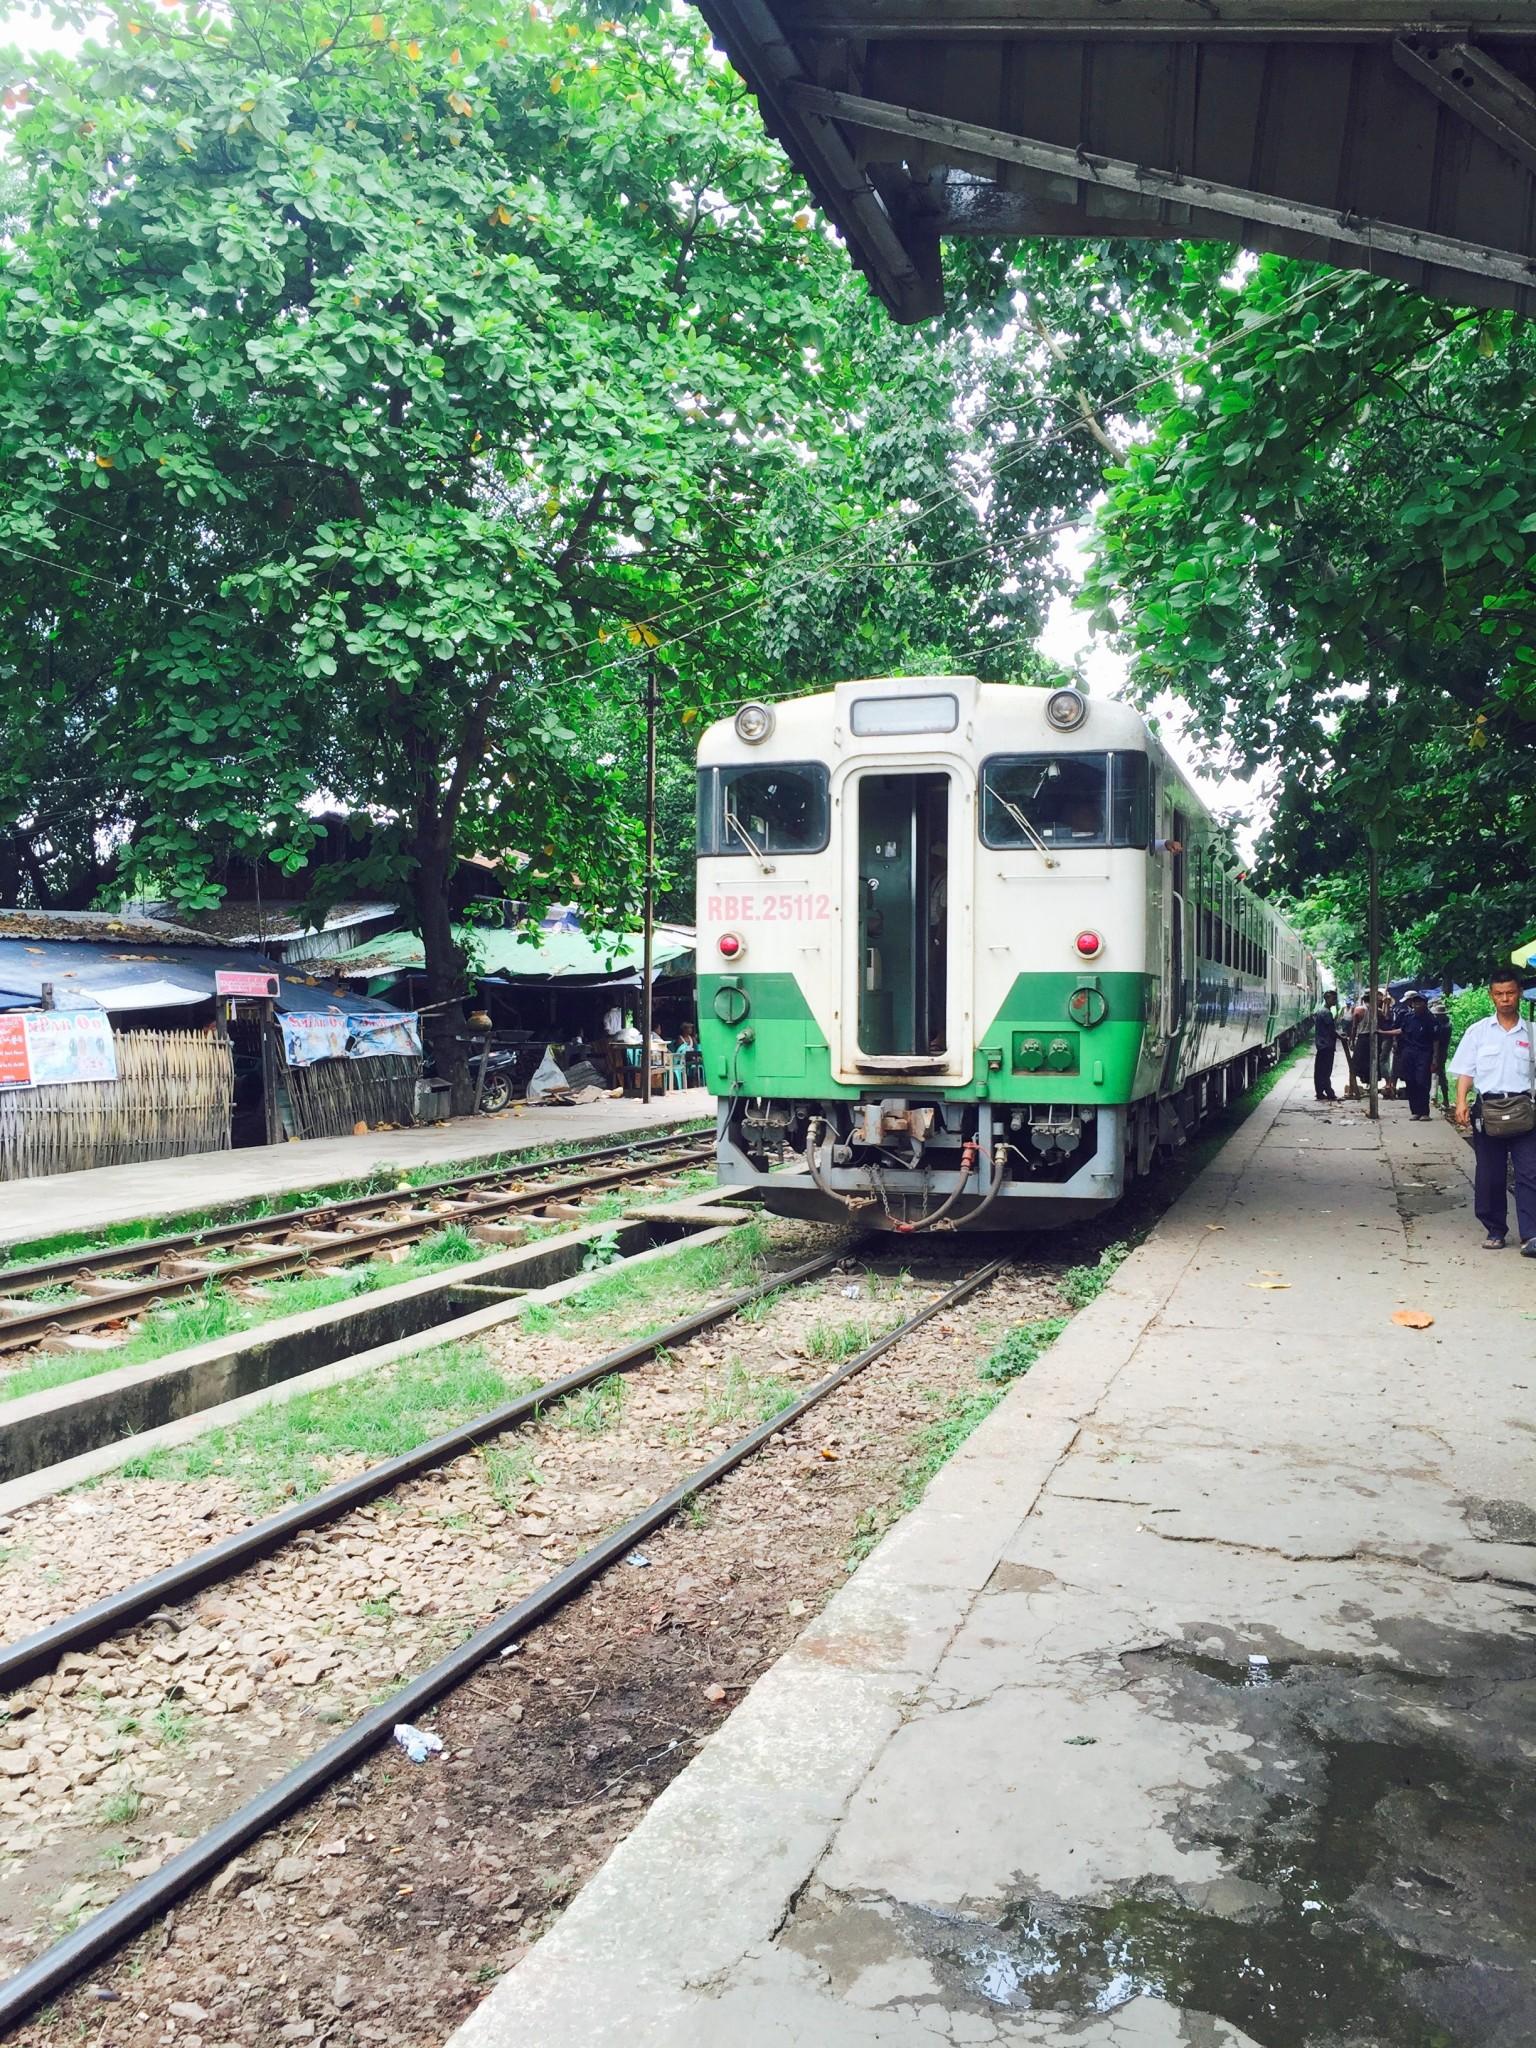 The Circular Train